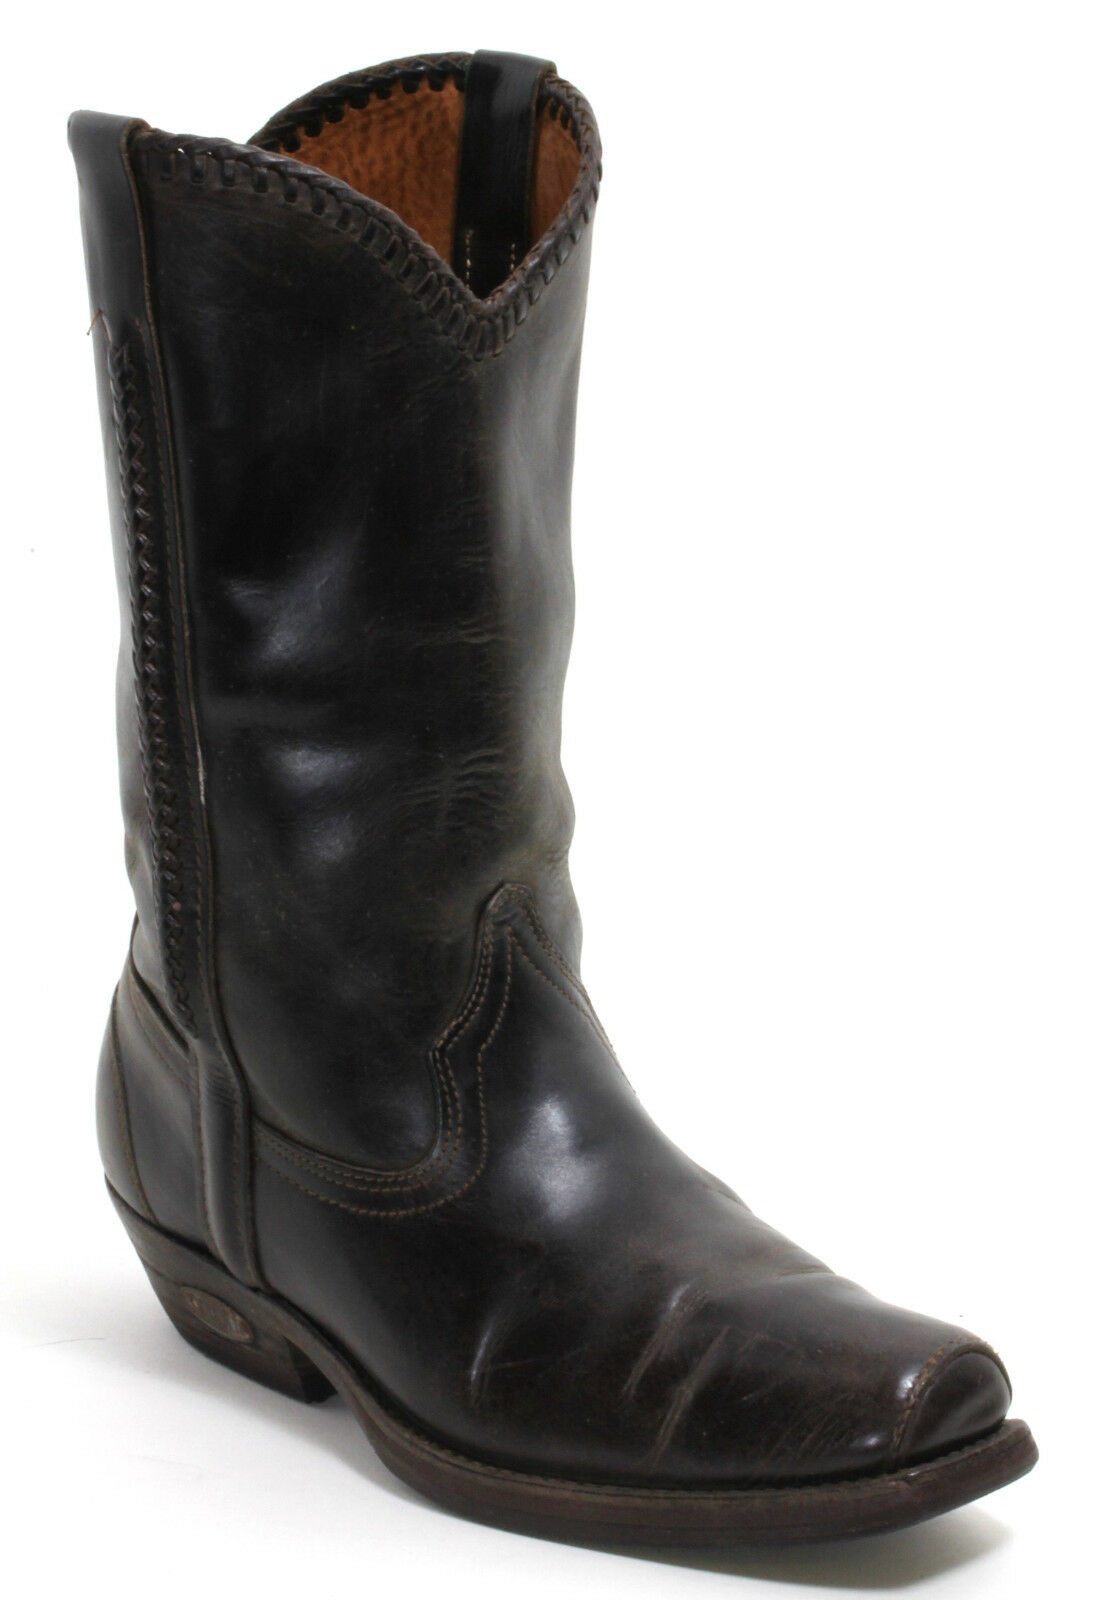 Westernstiefel Cowboystiefel Catalan Style Line Dance Farmer Boots Loblan 40